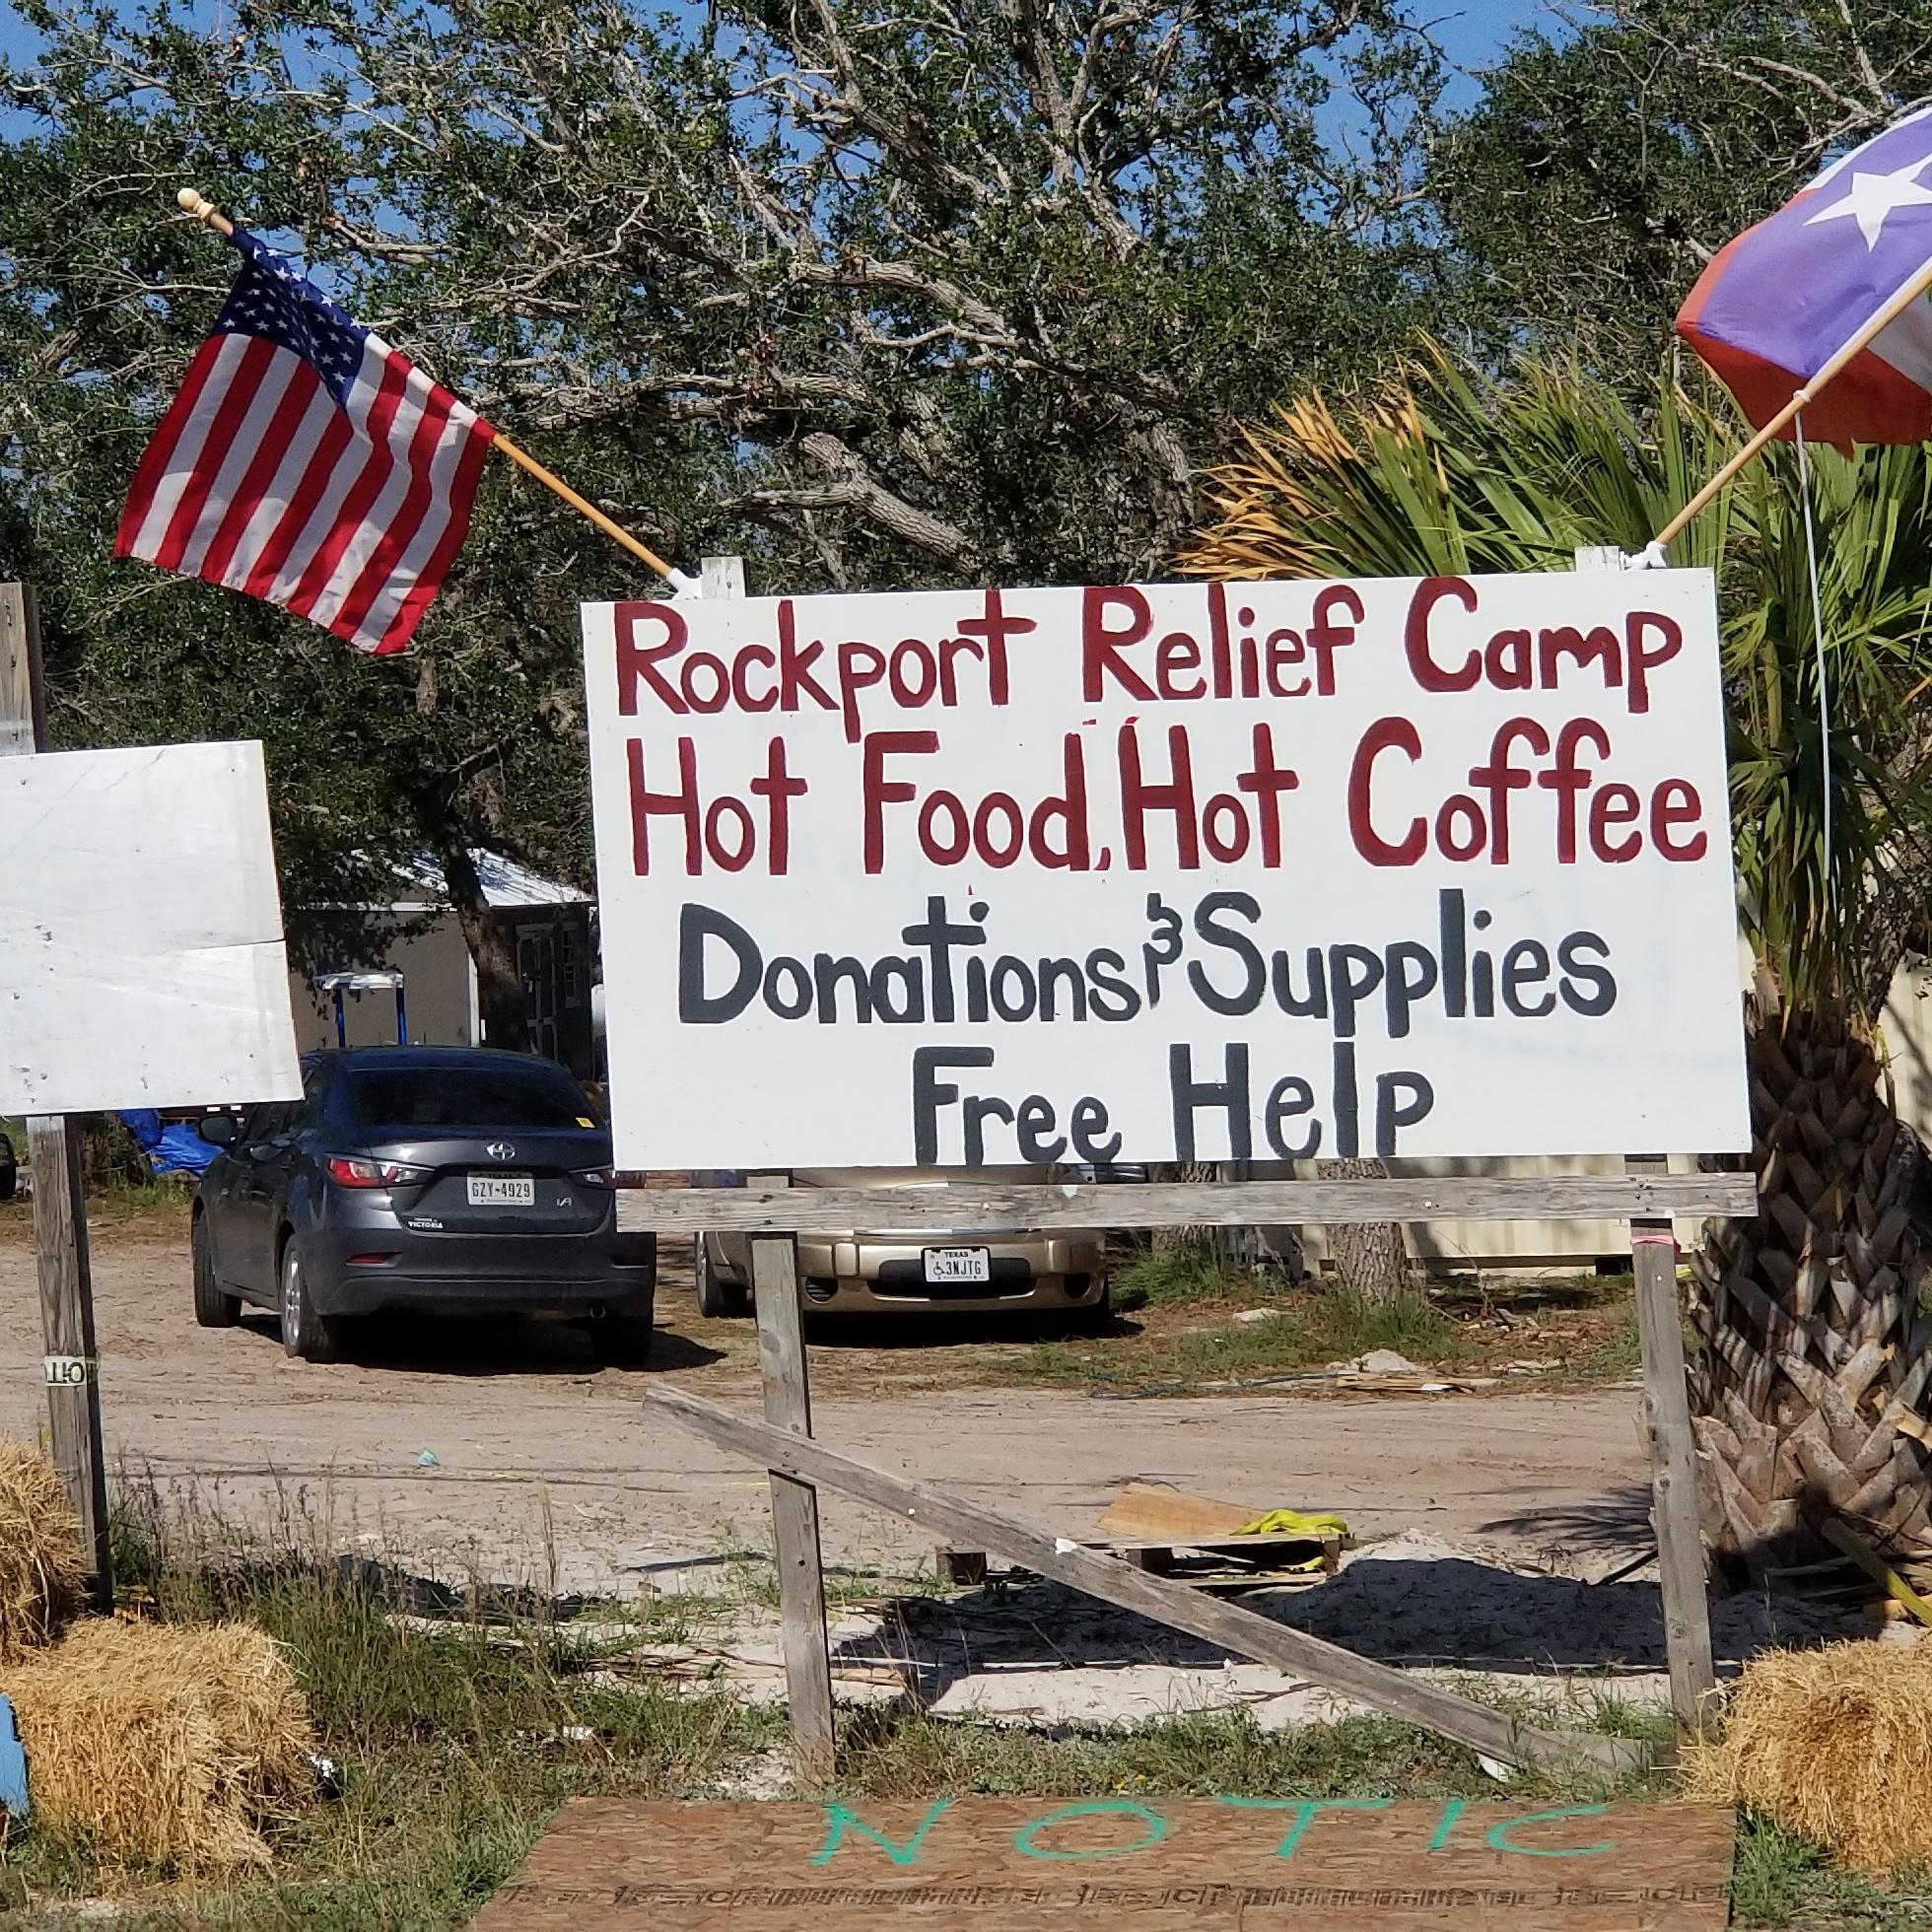 Housing Shortage On Texas Coast Persists Months After Hurricane Harvey | Texas Public Radio